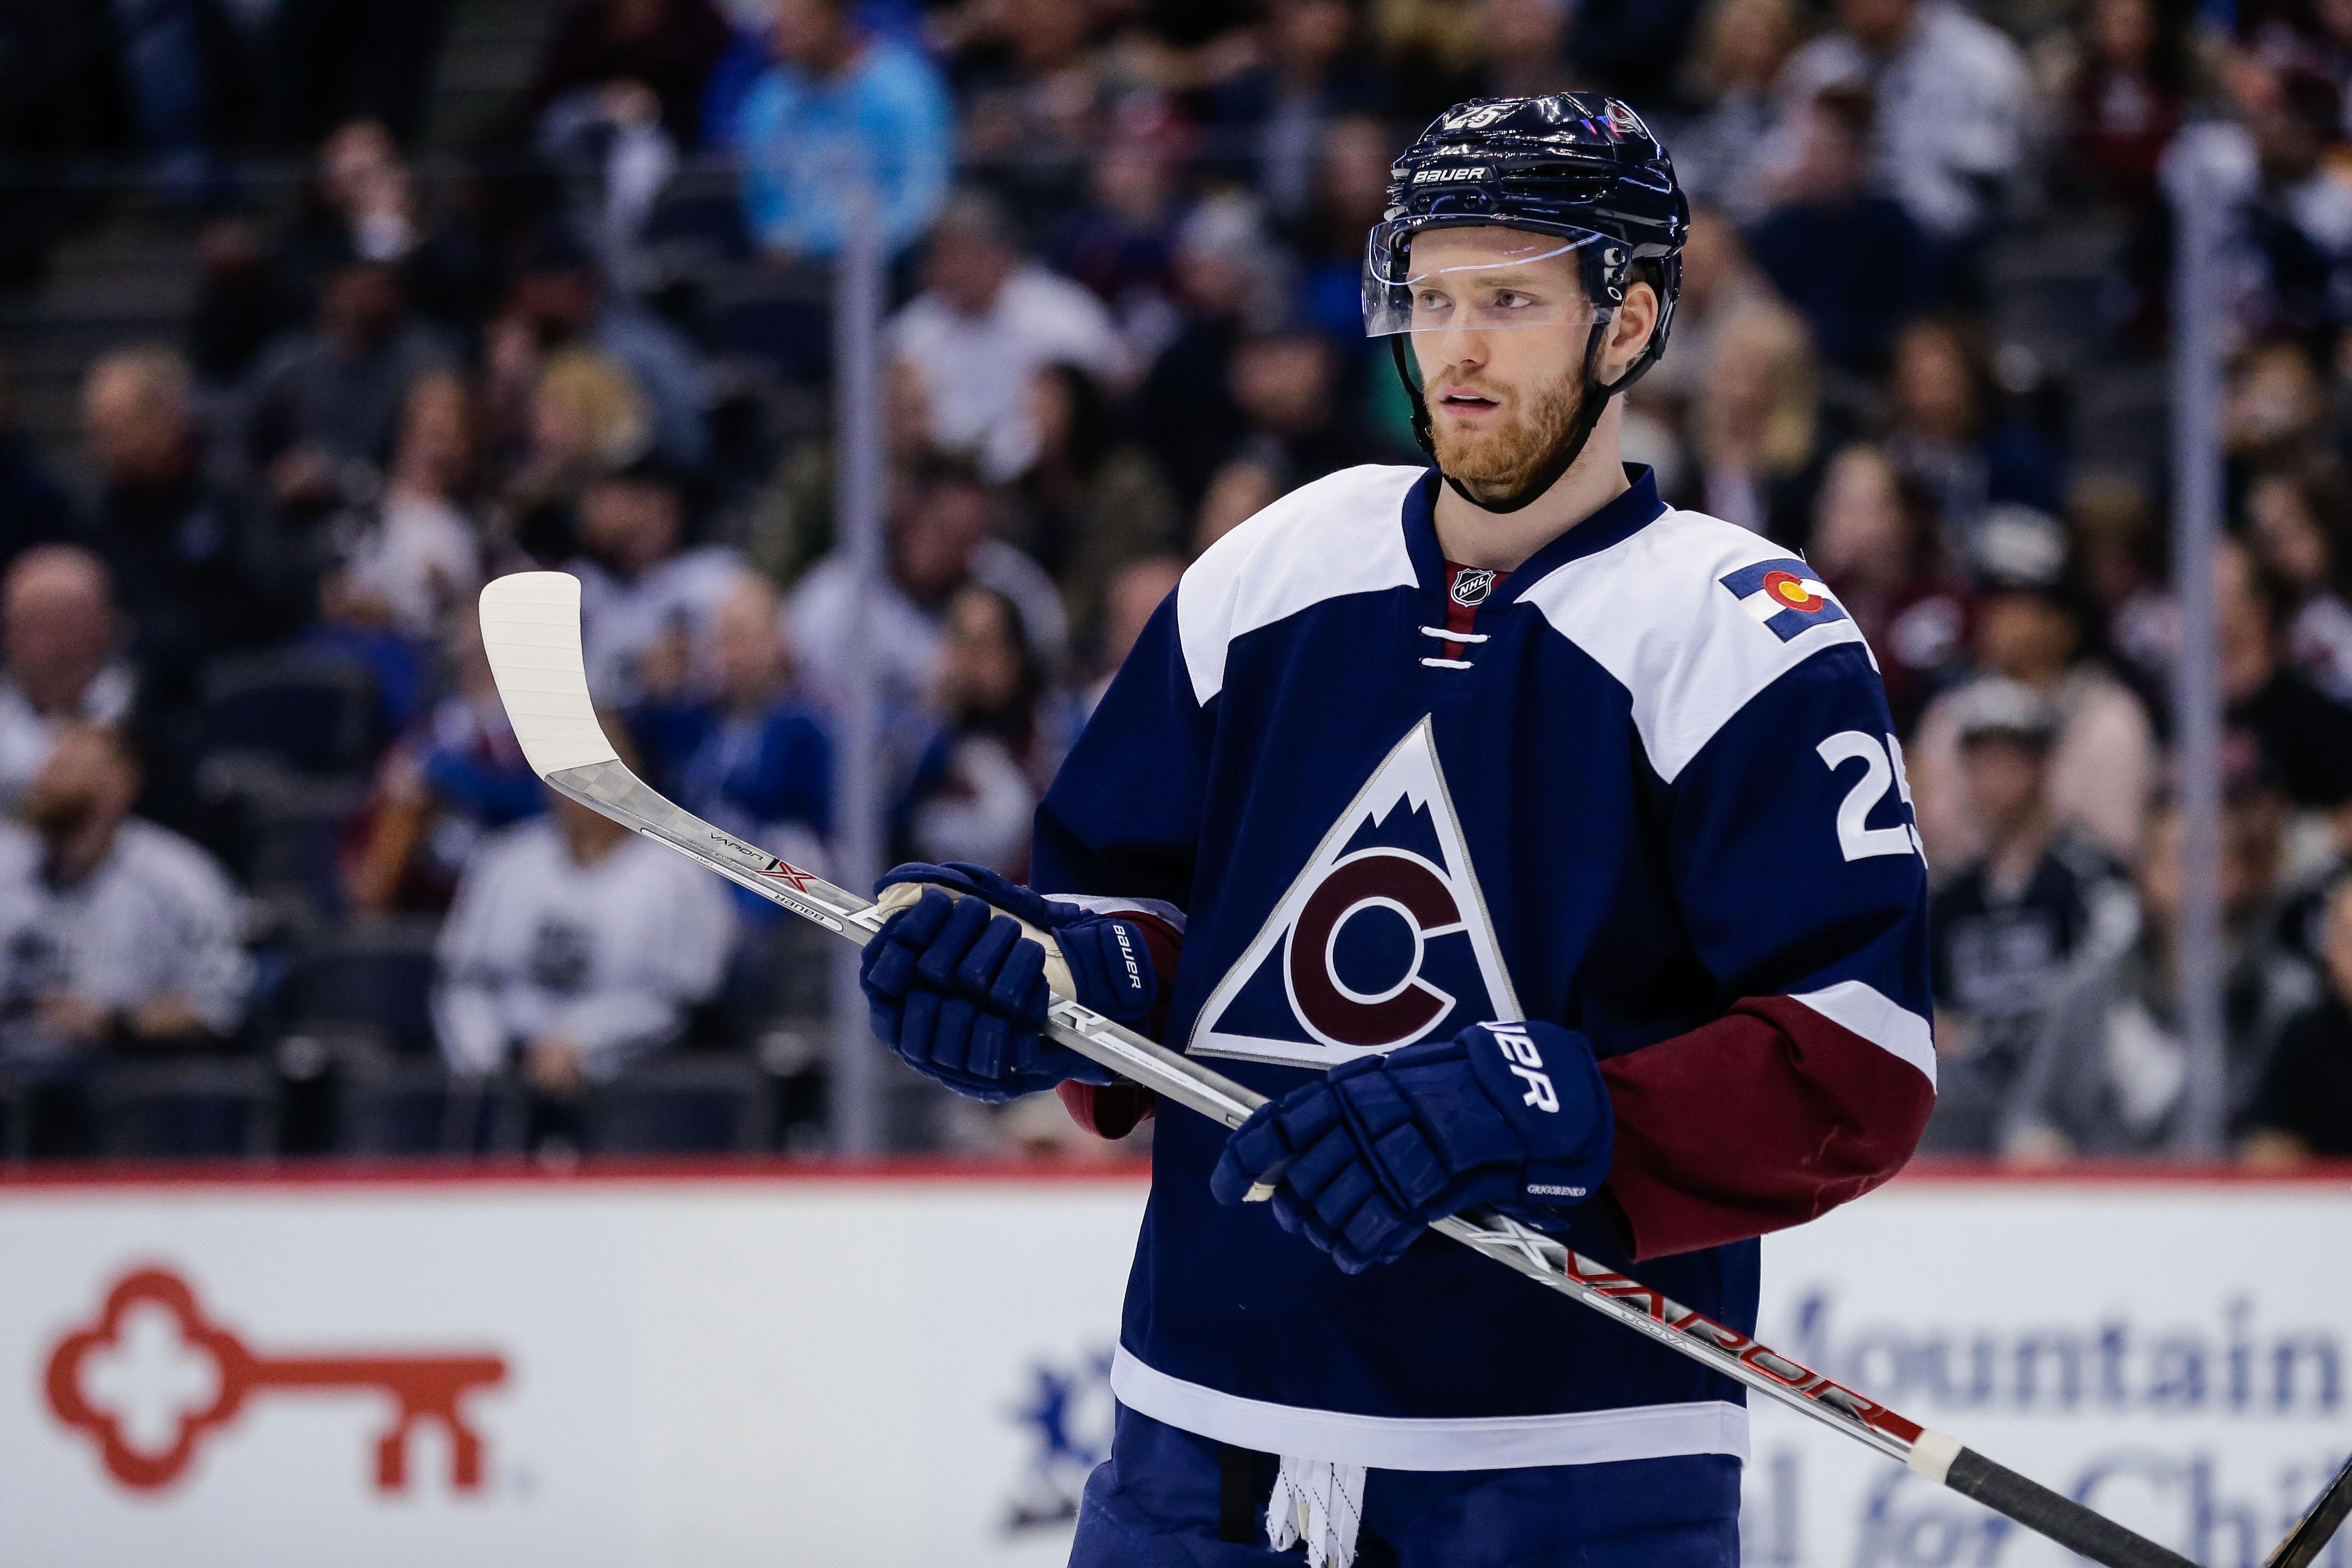 NHL: Los Angeles Kings at Colorado Avalanche